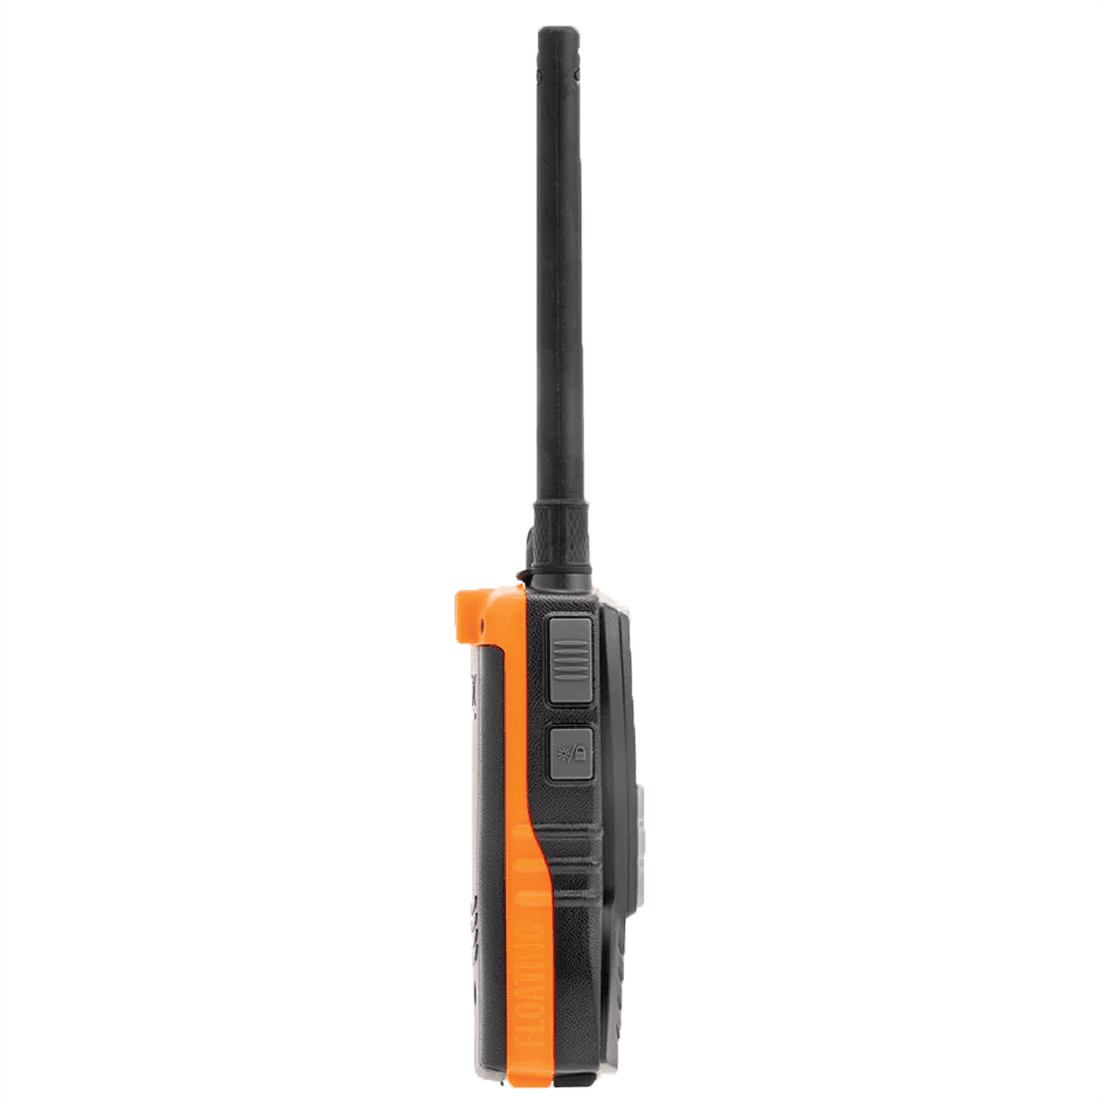 Cobra Marine Handheld and GMRS Lapel Speaker Microphone Accessory 10